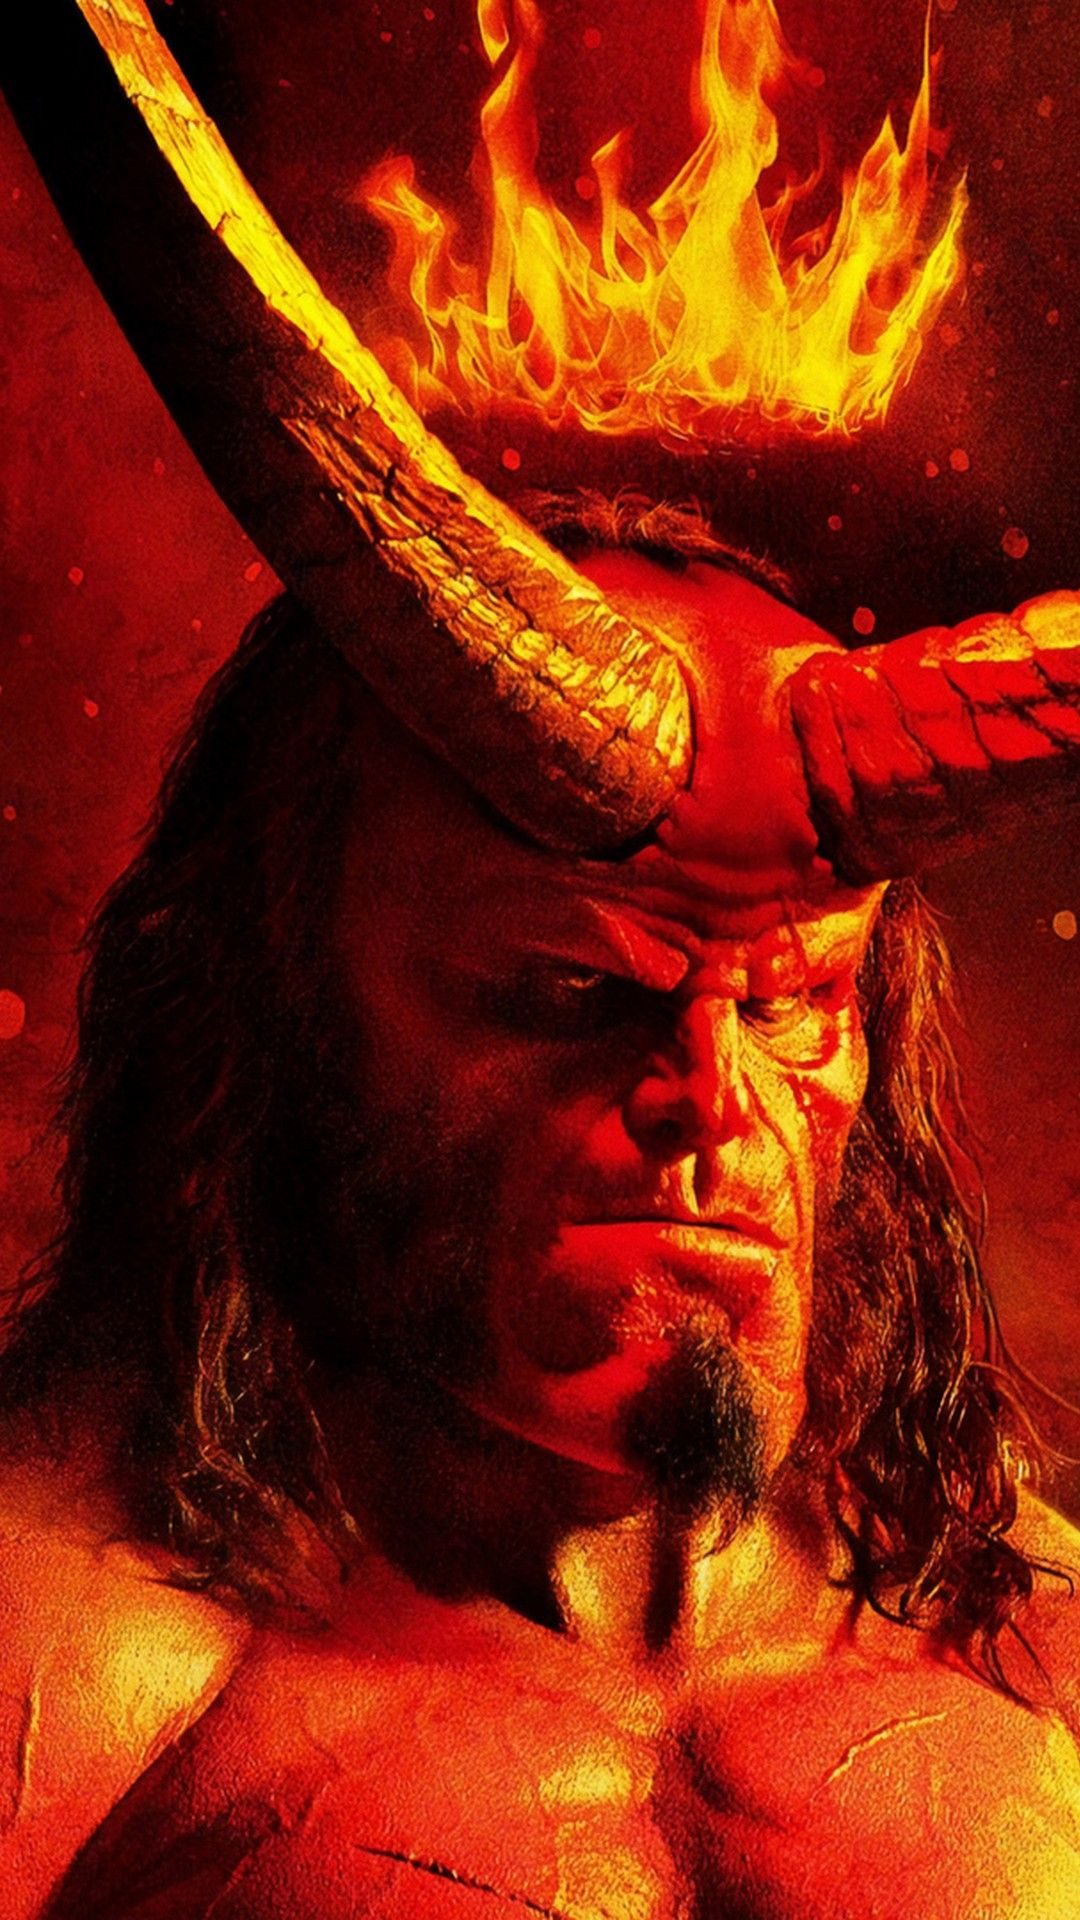 Hellboy 2019 poster hd best movie poster wallpaper hd